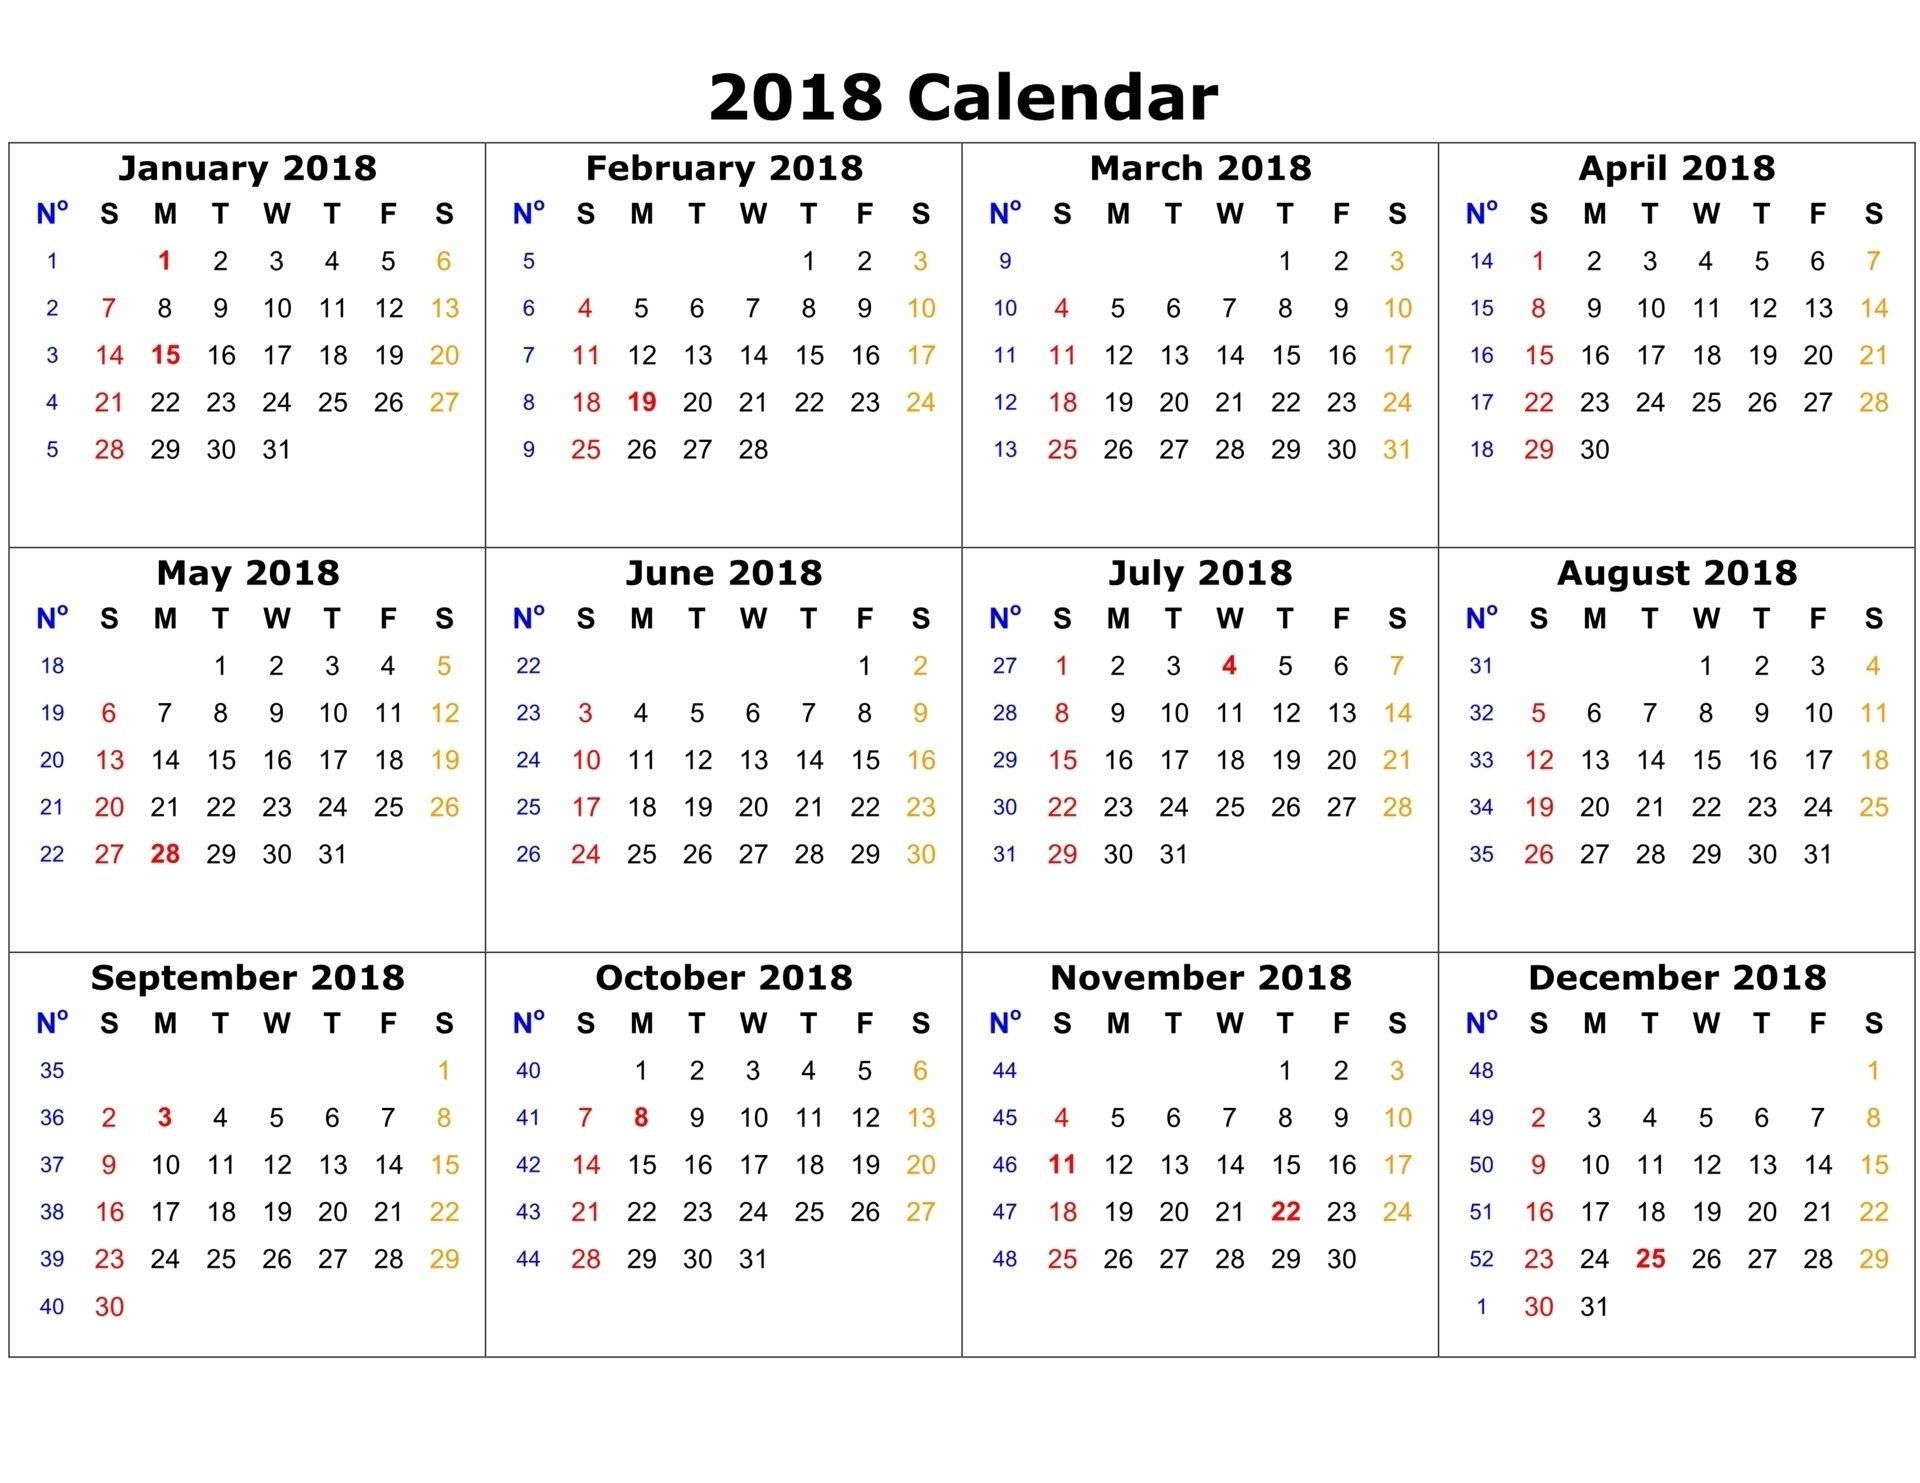 free printable calendar 2018 free printable calendar printable 12 Month 2018 Printable Calendar erdferdf